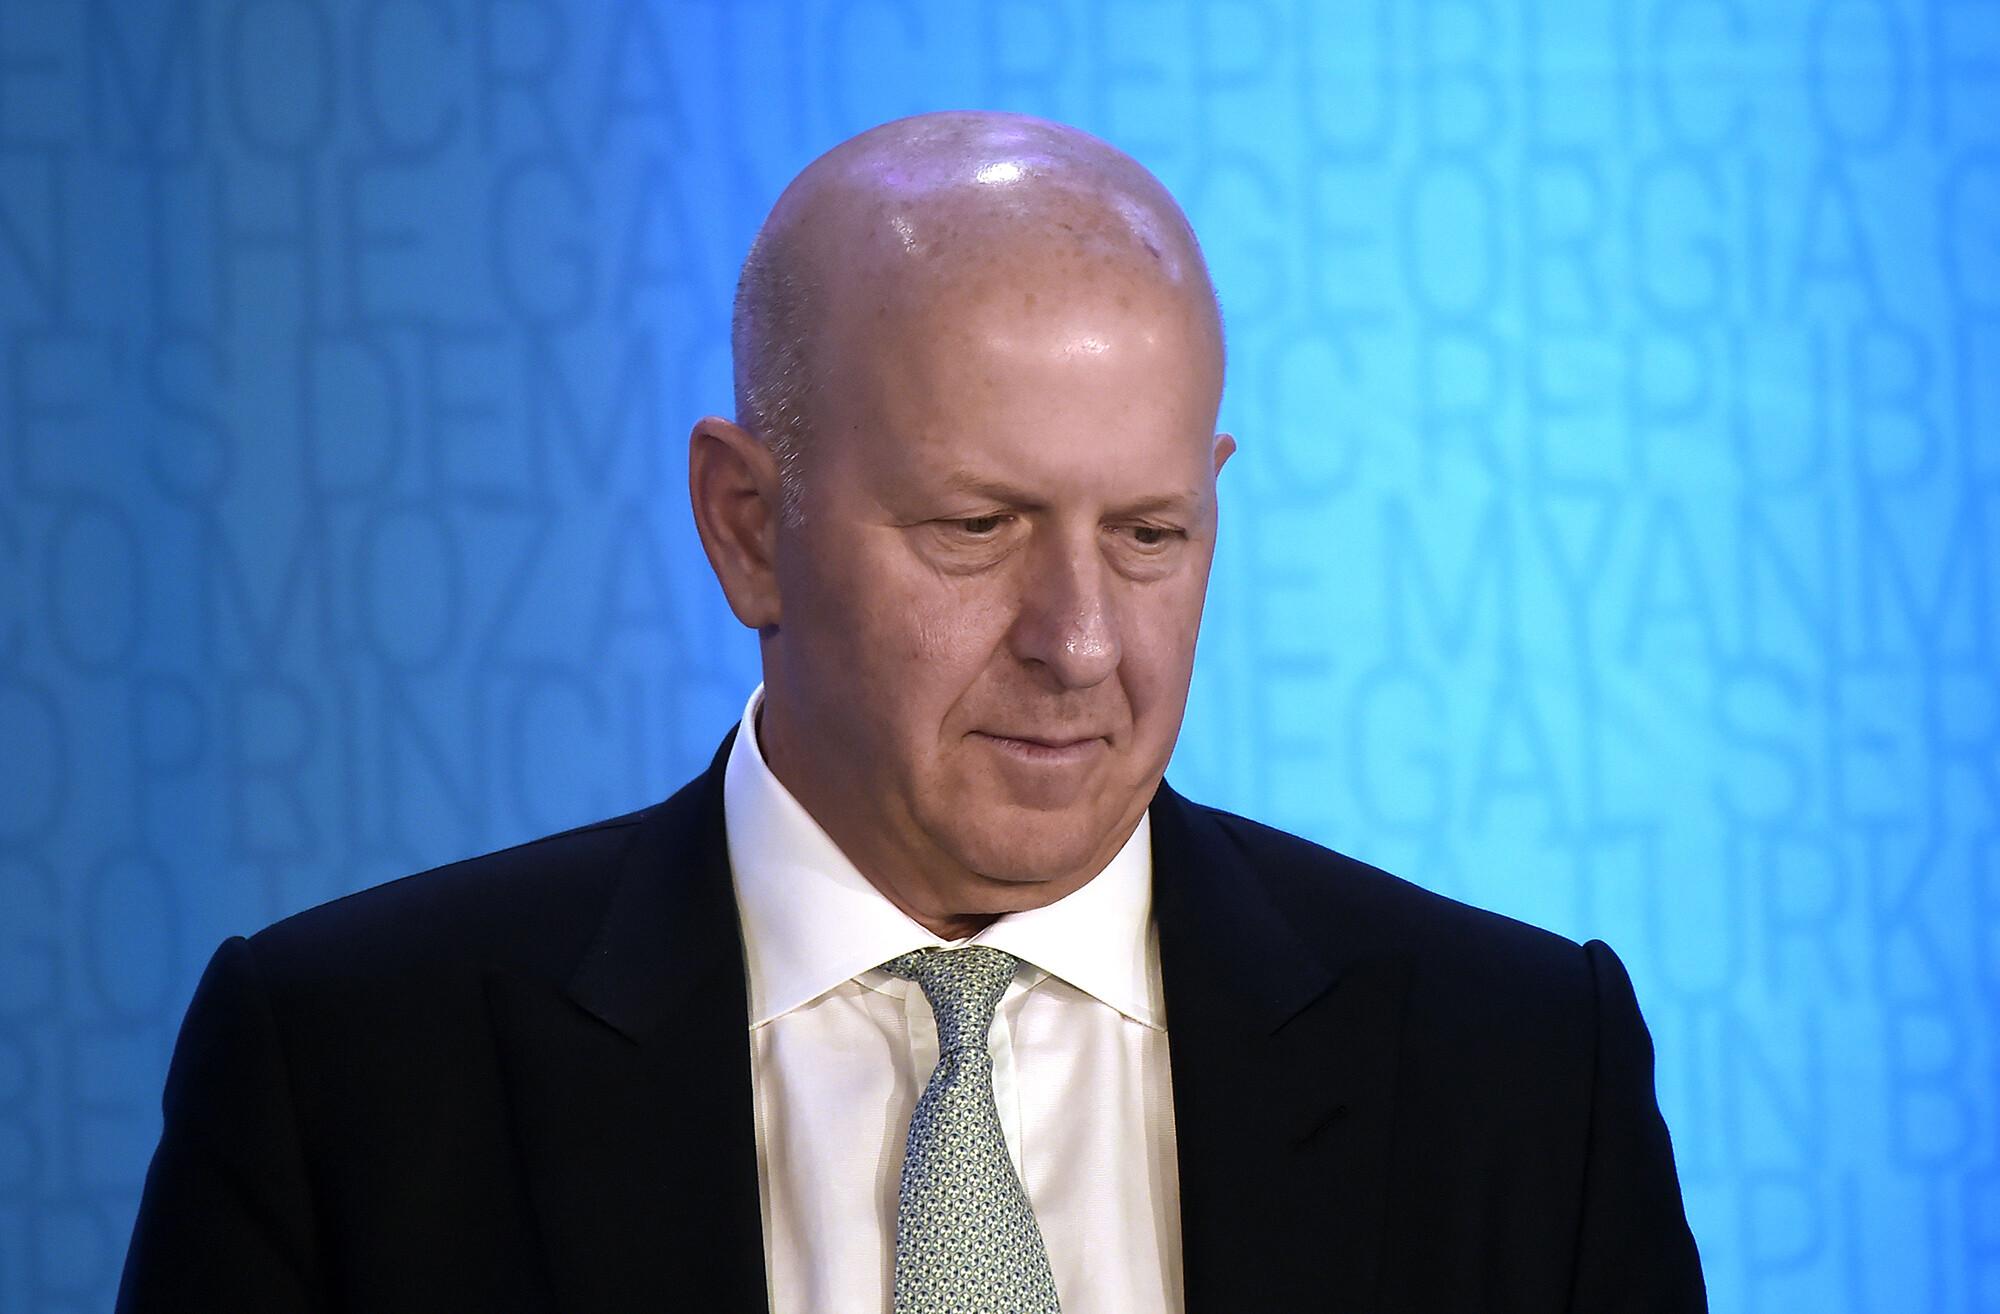 Goldman Sachs posts $5.5 billion profit as the stock market booms